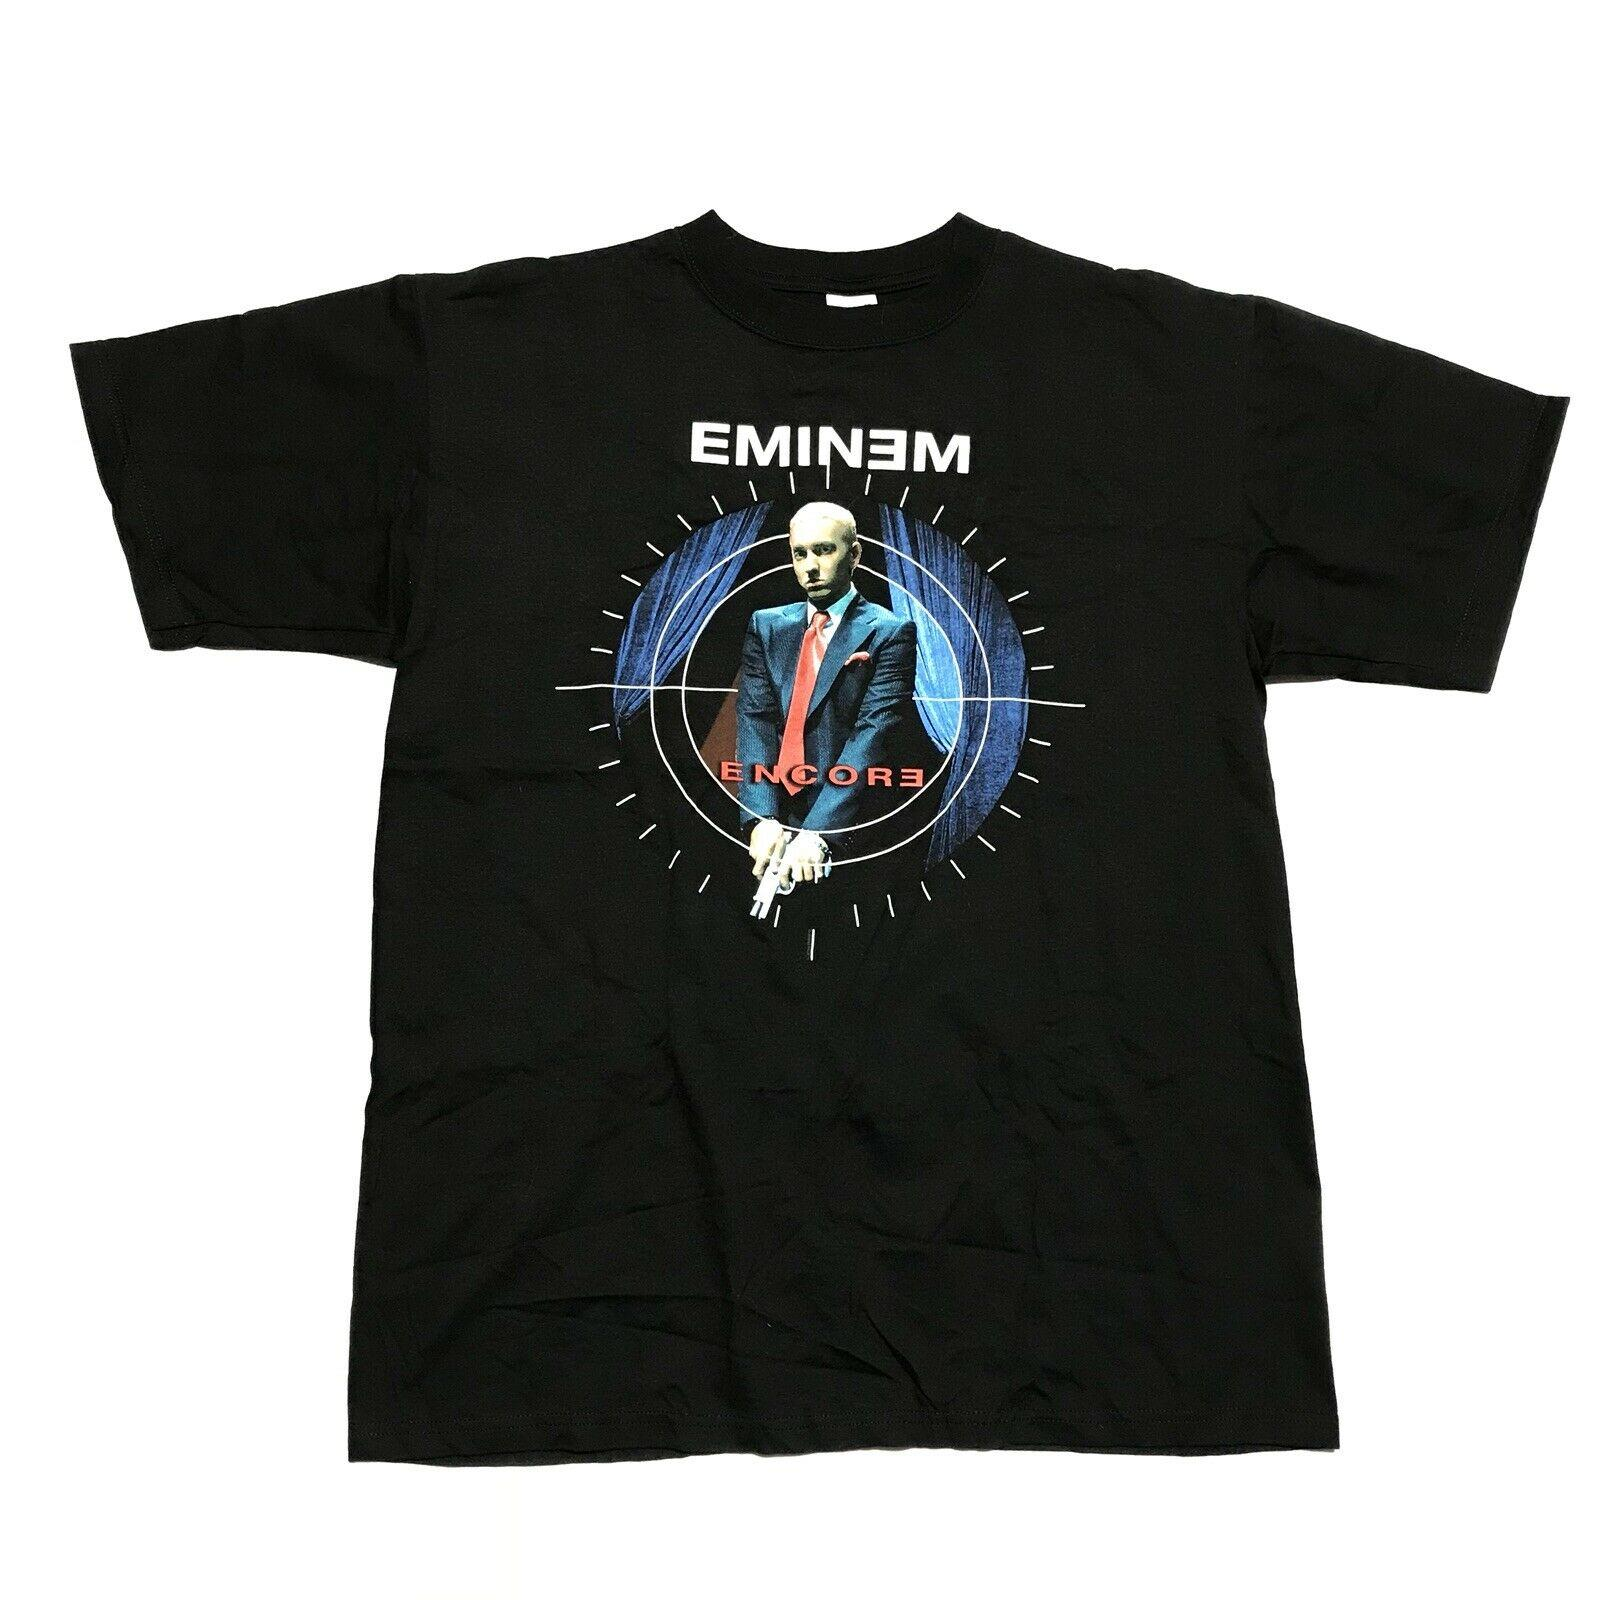 Vintage Dead Vektor 2004 Eminem Encore-T-Shirt ORIGINAL Dre D12 Sz Große Rap T-Männer 100% Baumwolle Kurzarm-Druck-T-Shirt